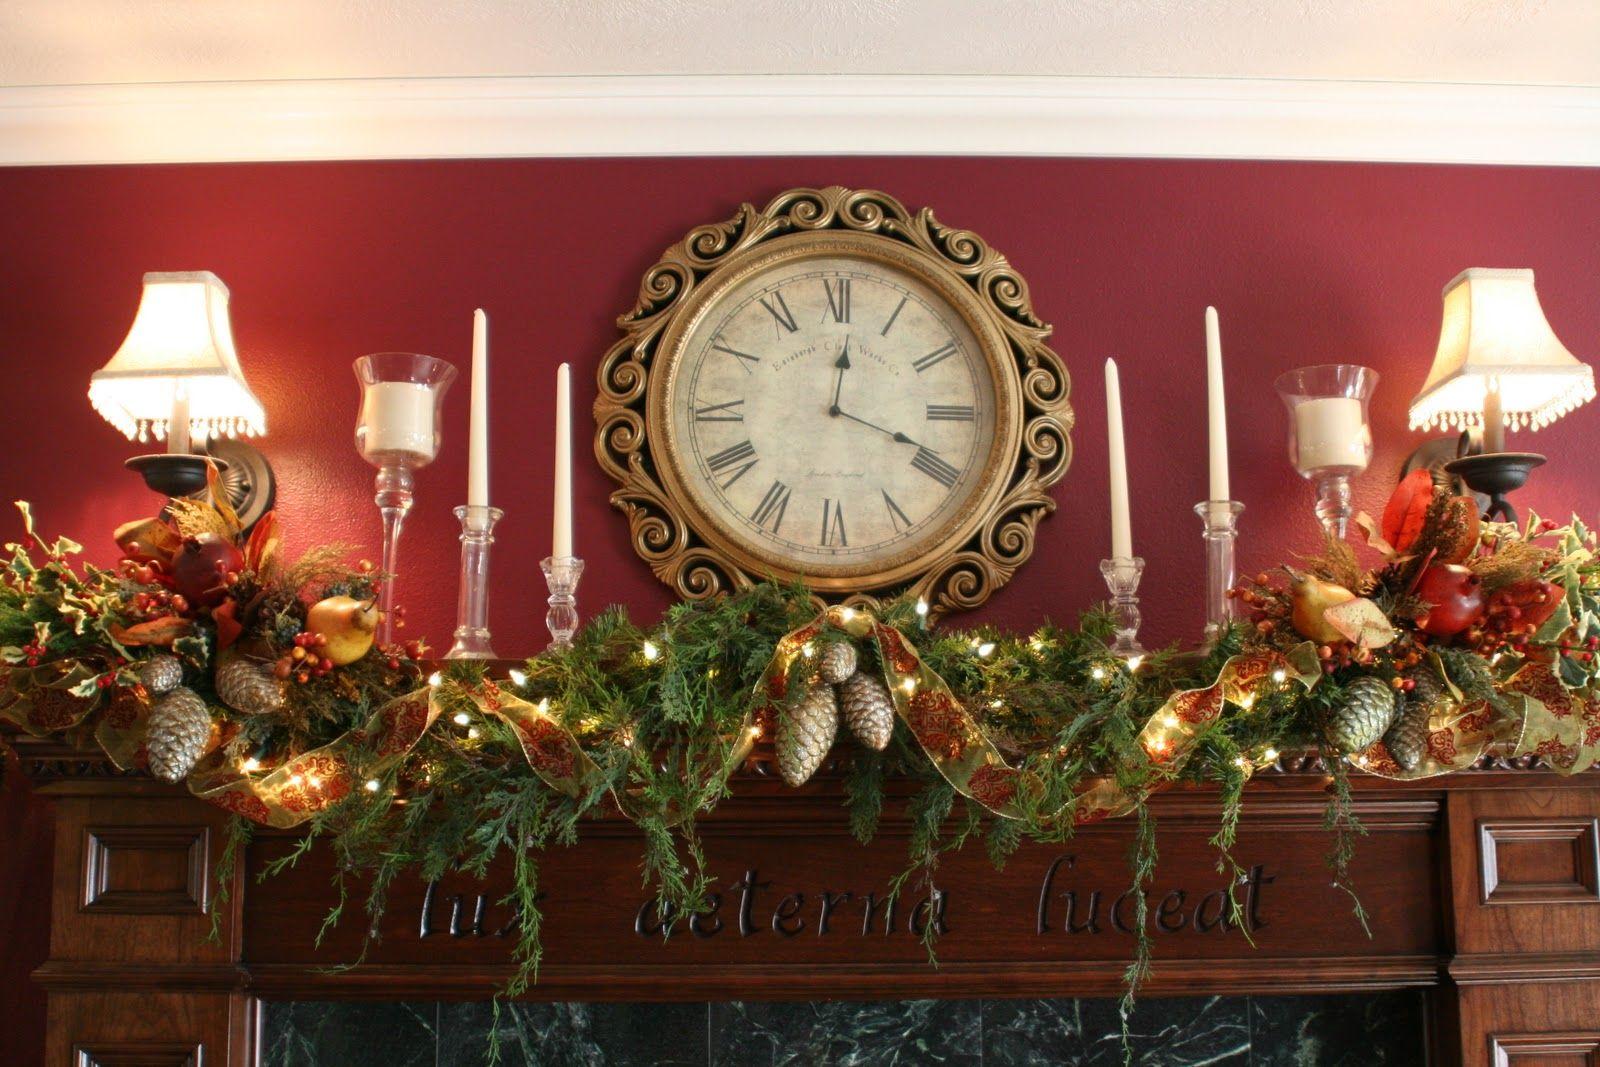 Vintage Christmas Mantel Decorations : Inspirational charles dickens christmas mantel and